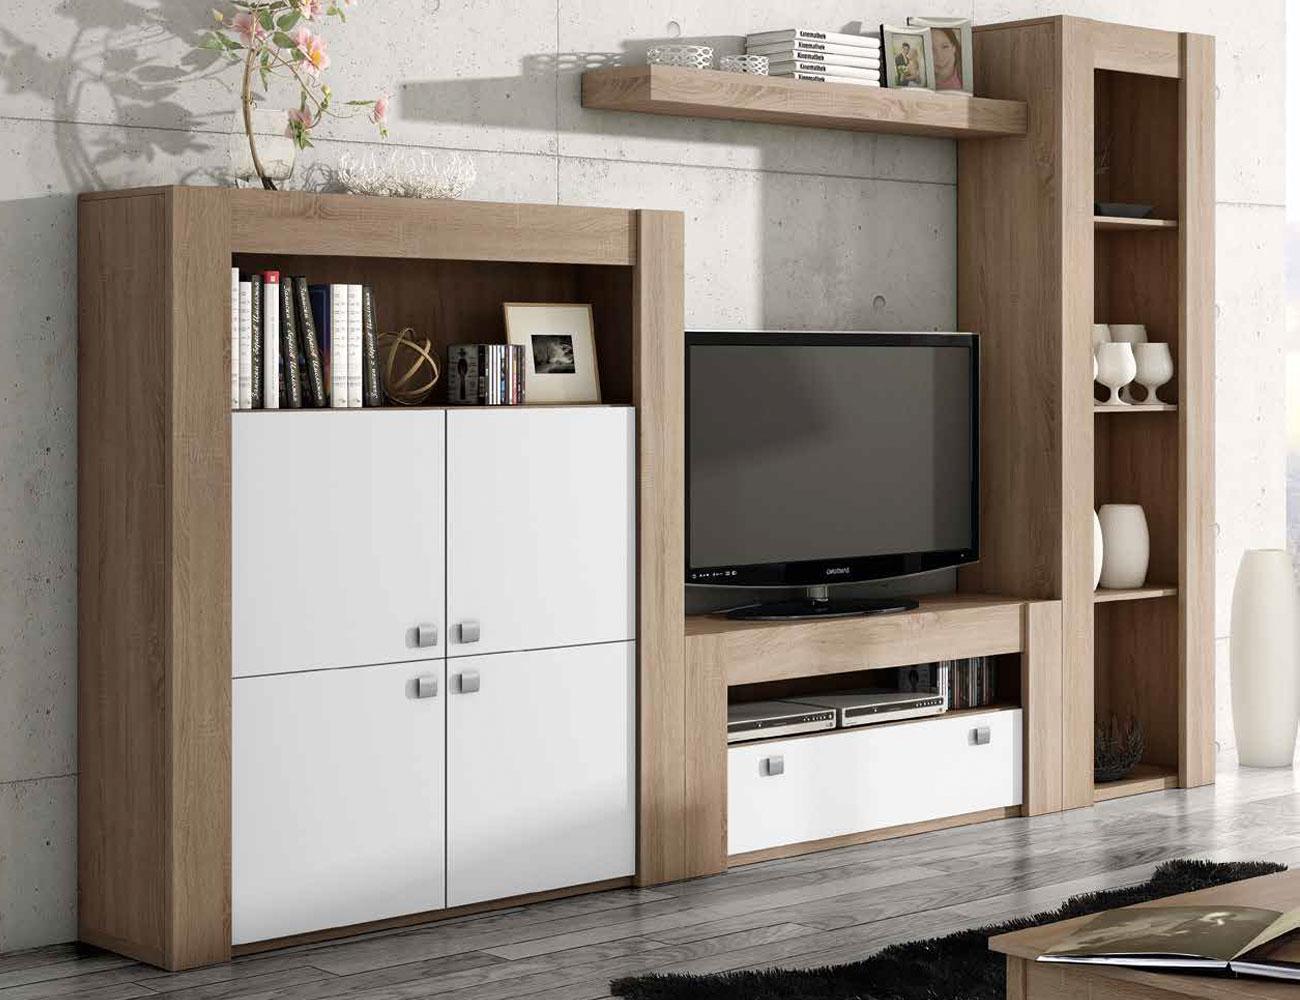 Mueble salon moderno comp03a1